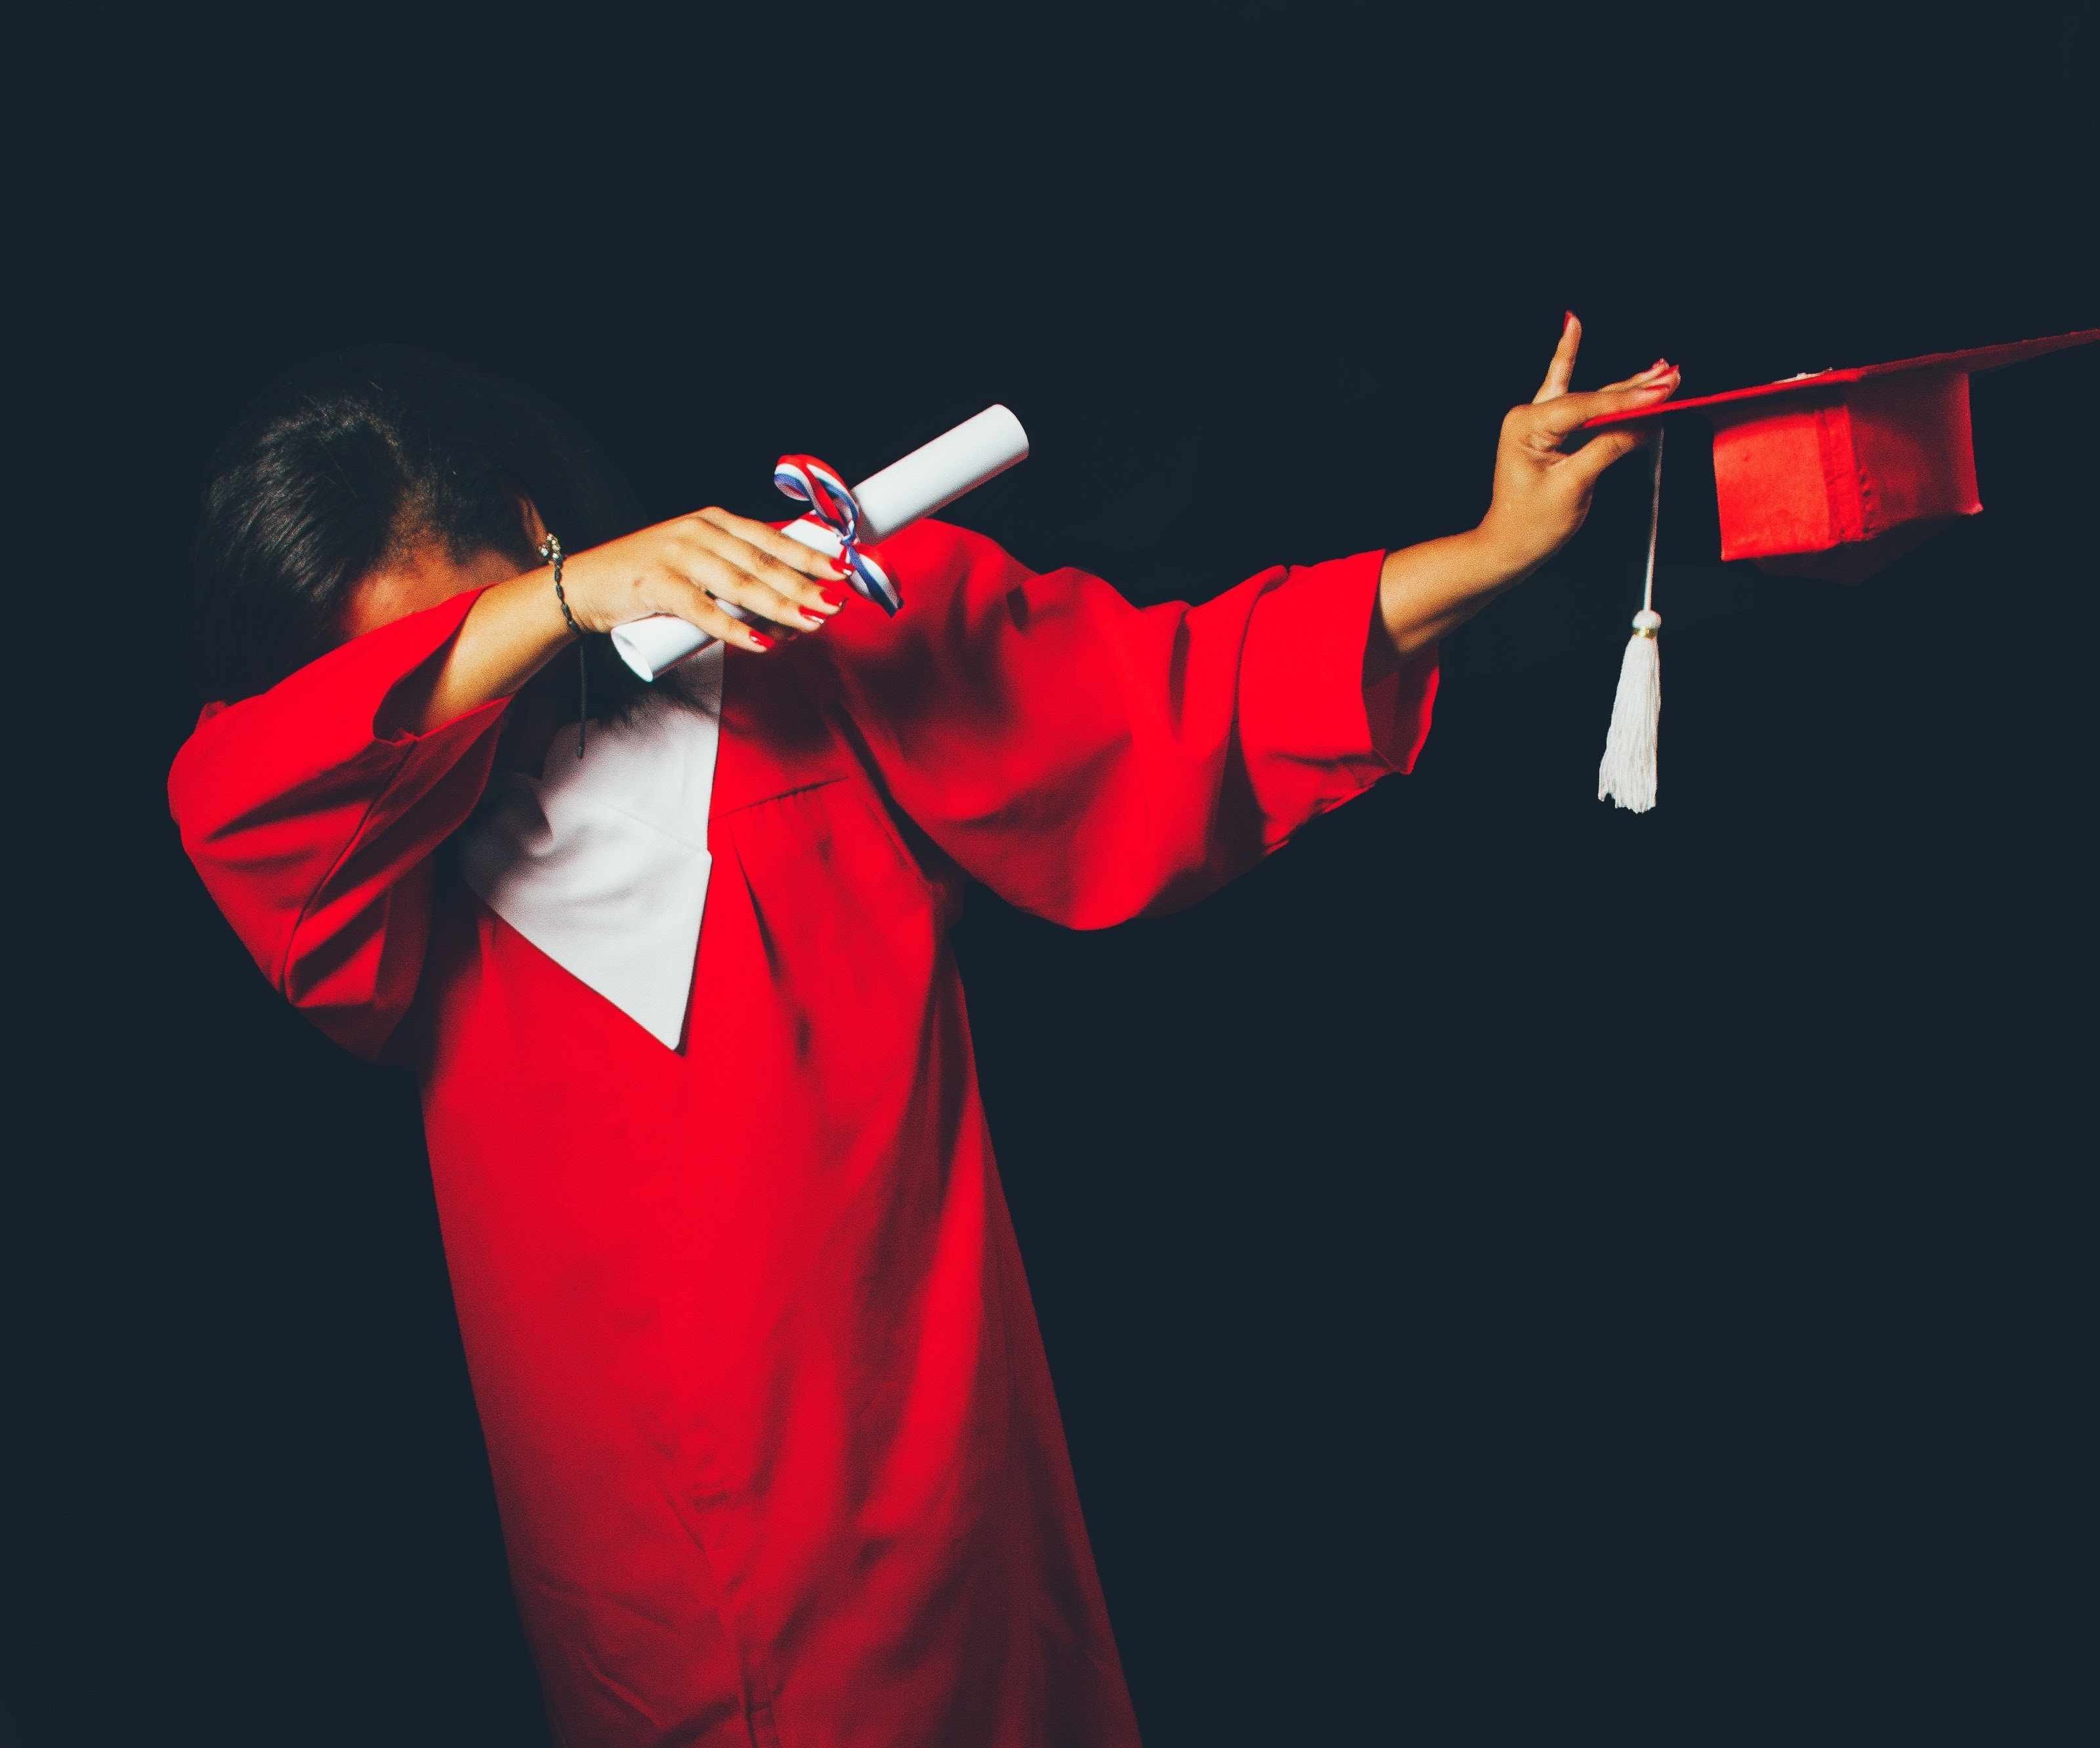 Abschluss Diplom erhalten